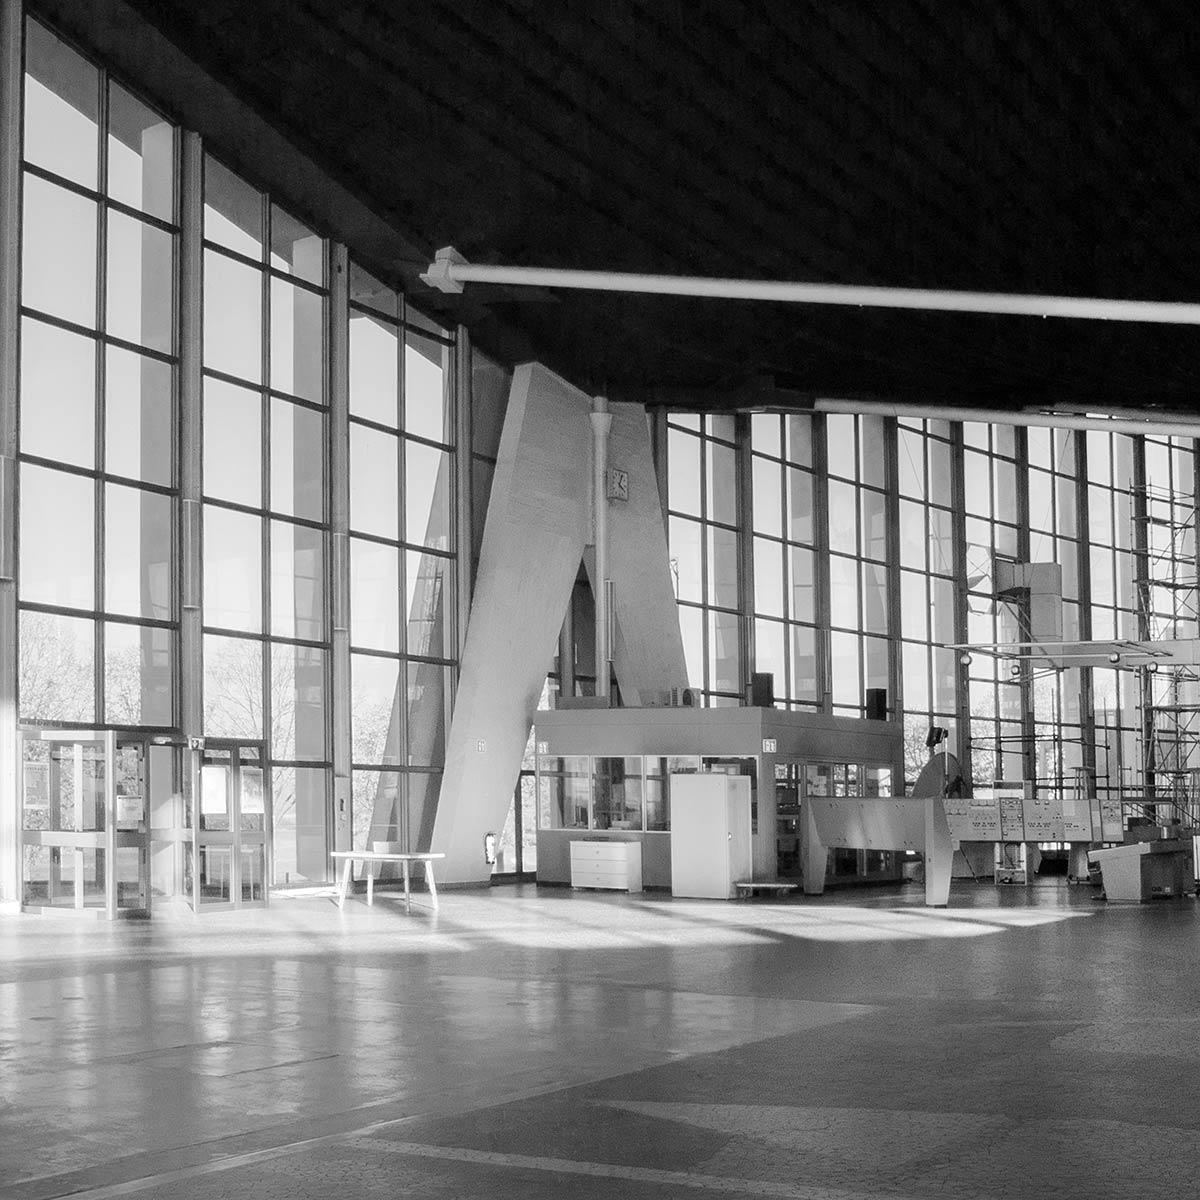 Archtektur_Europe1_MH10285